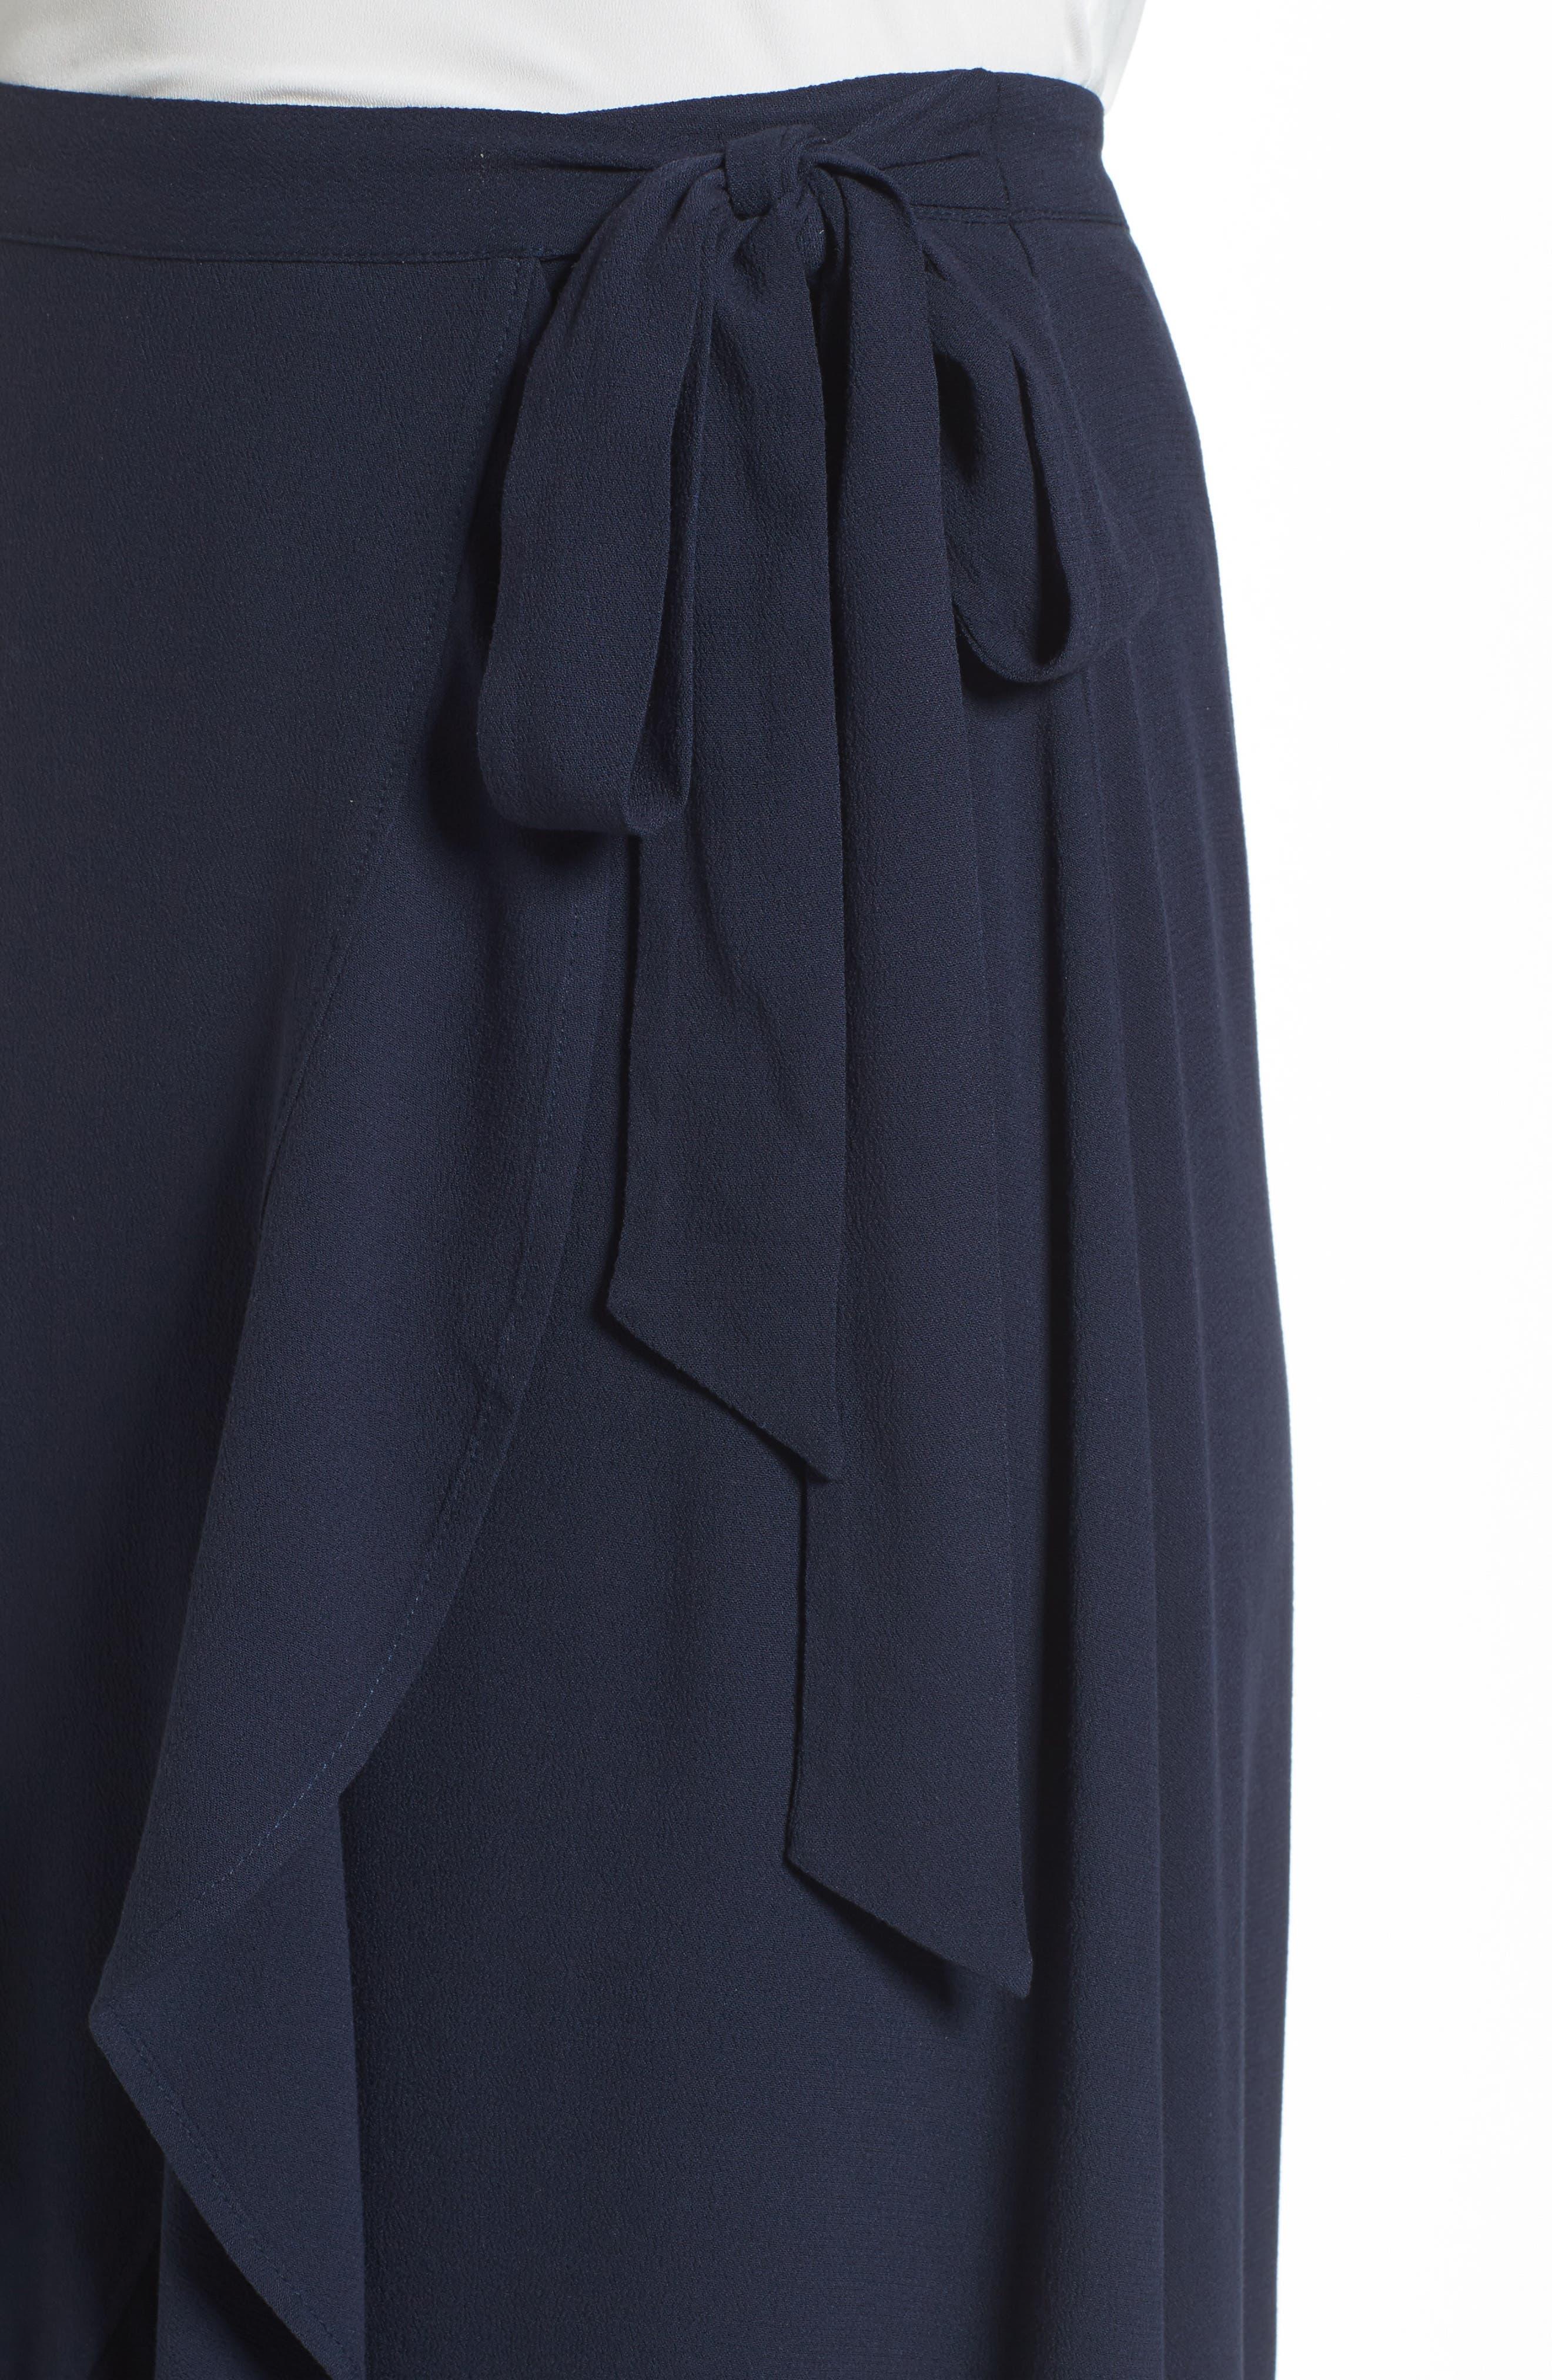 Ruffle Wrap Skirt,                             Alternate thumbnail 4, color,                             Navy Sapphire